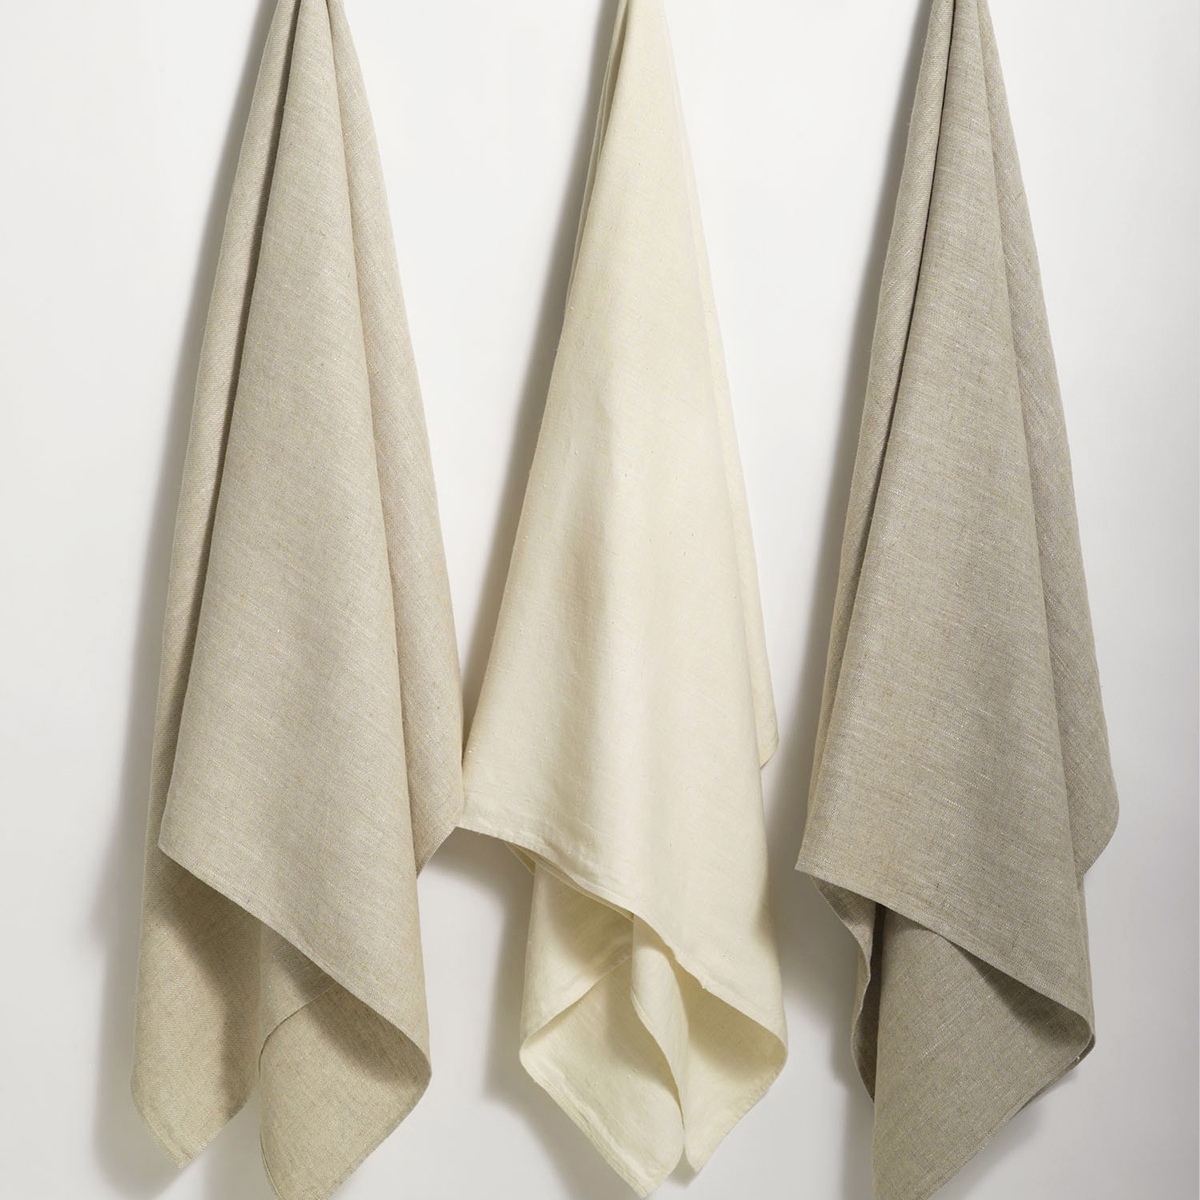 Donatas Flatweave Linen Towels